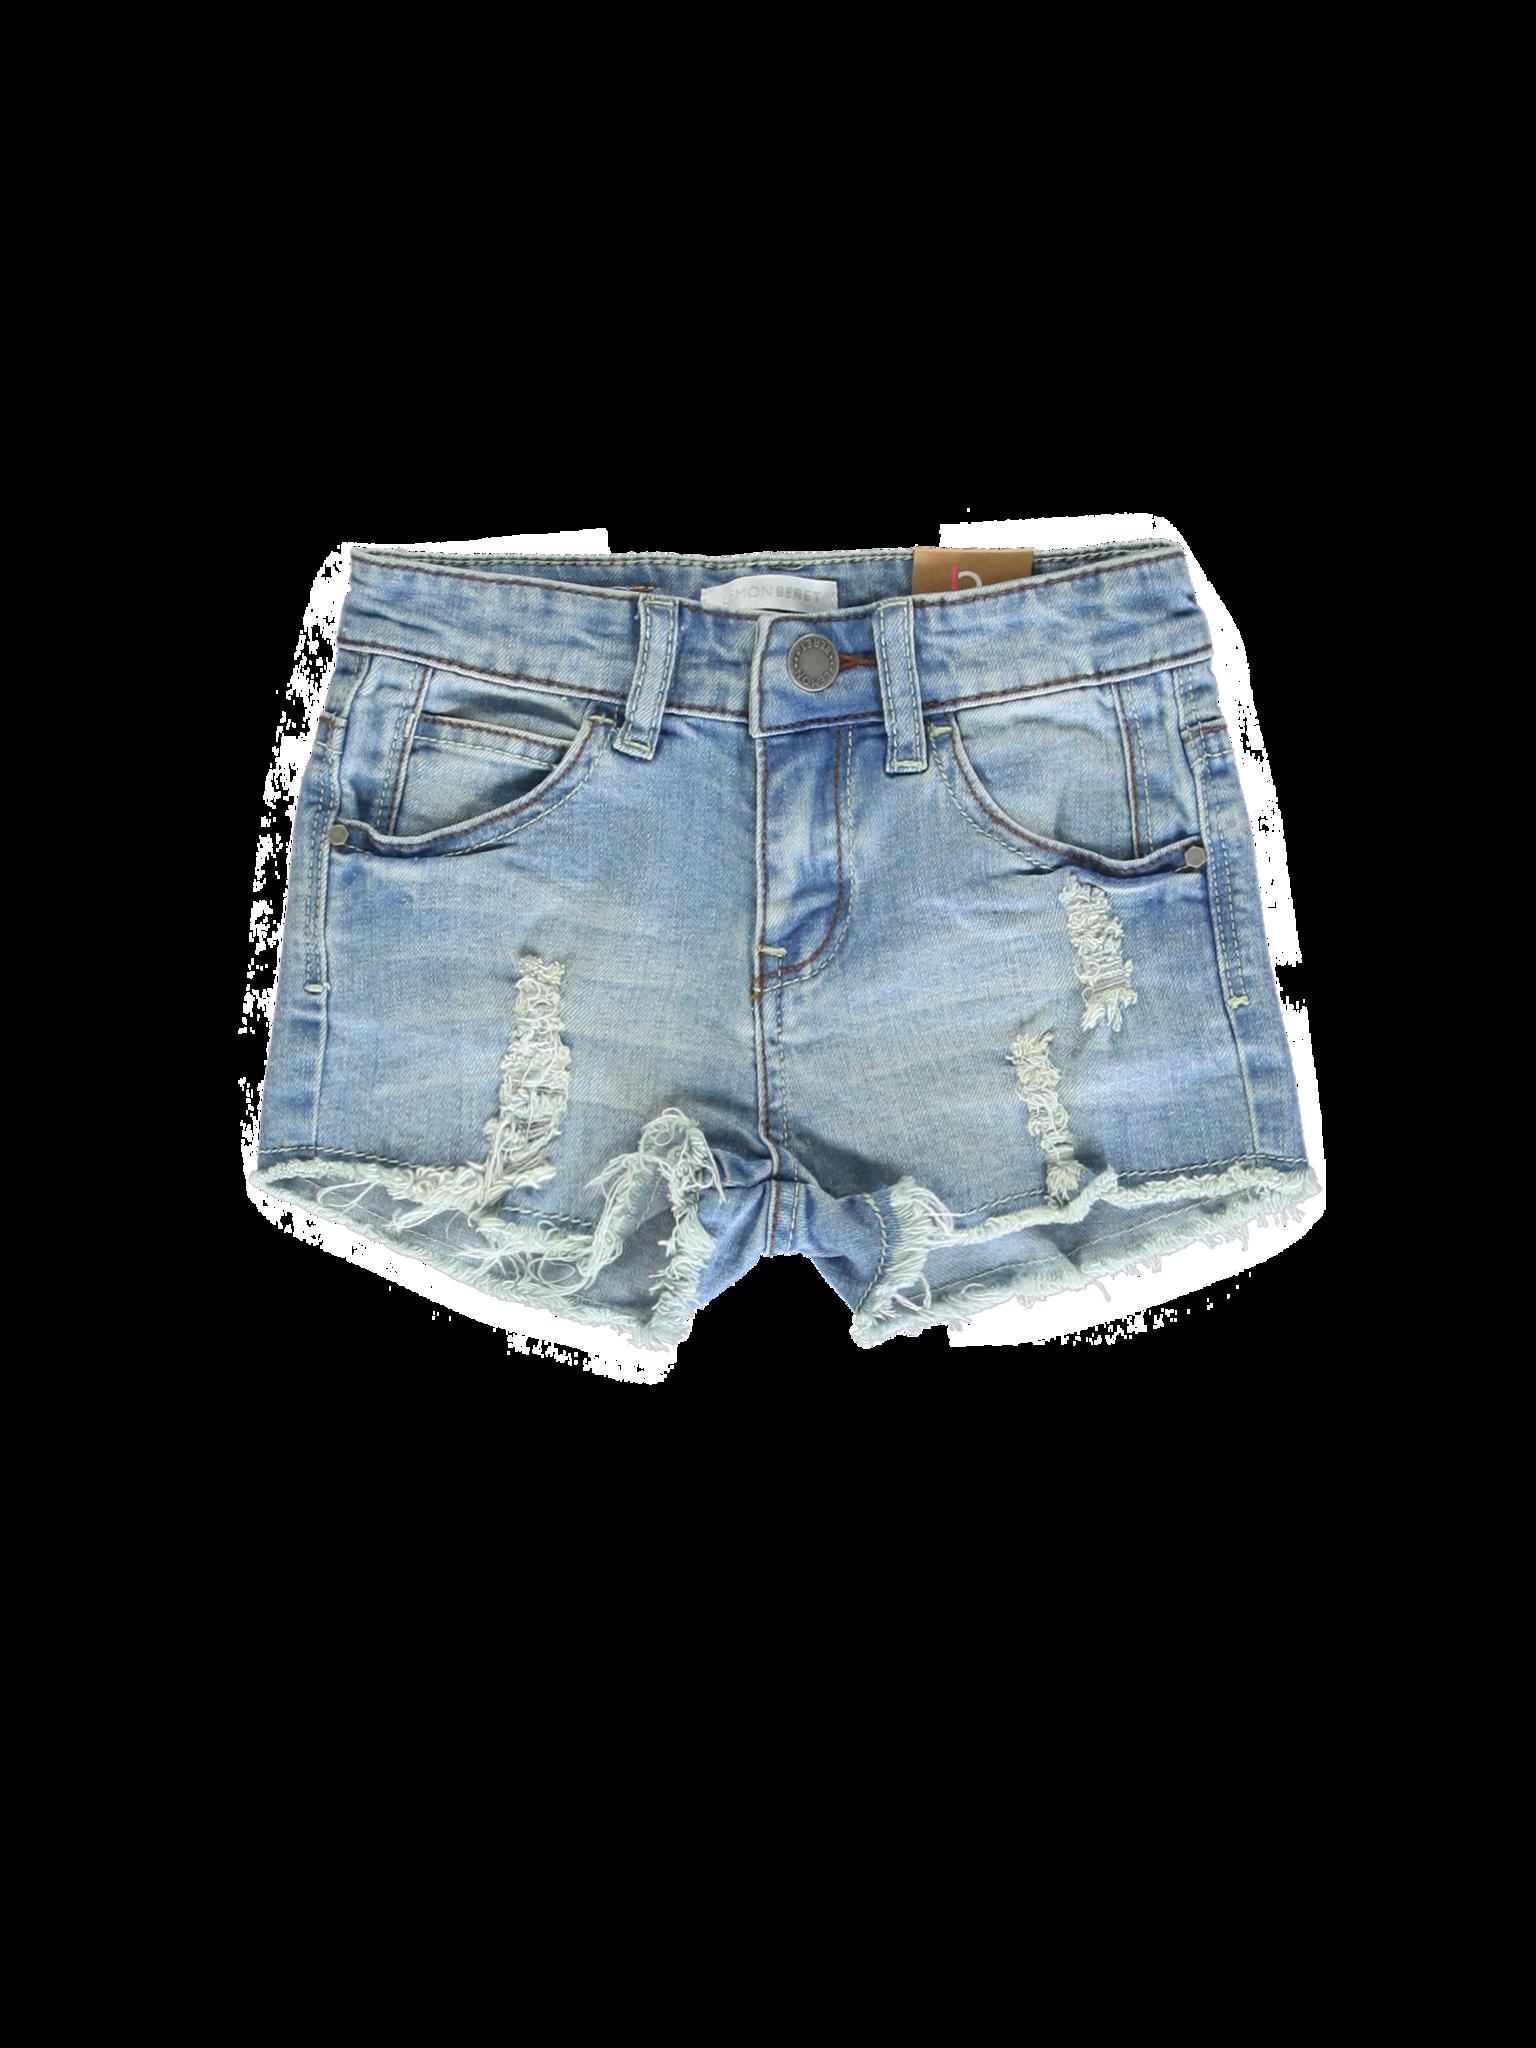 All Brands   Summerproducts Small Girls   Shorts   10 pcs/box